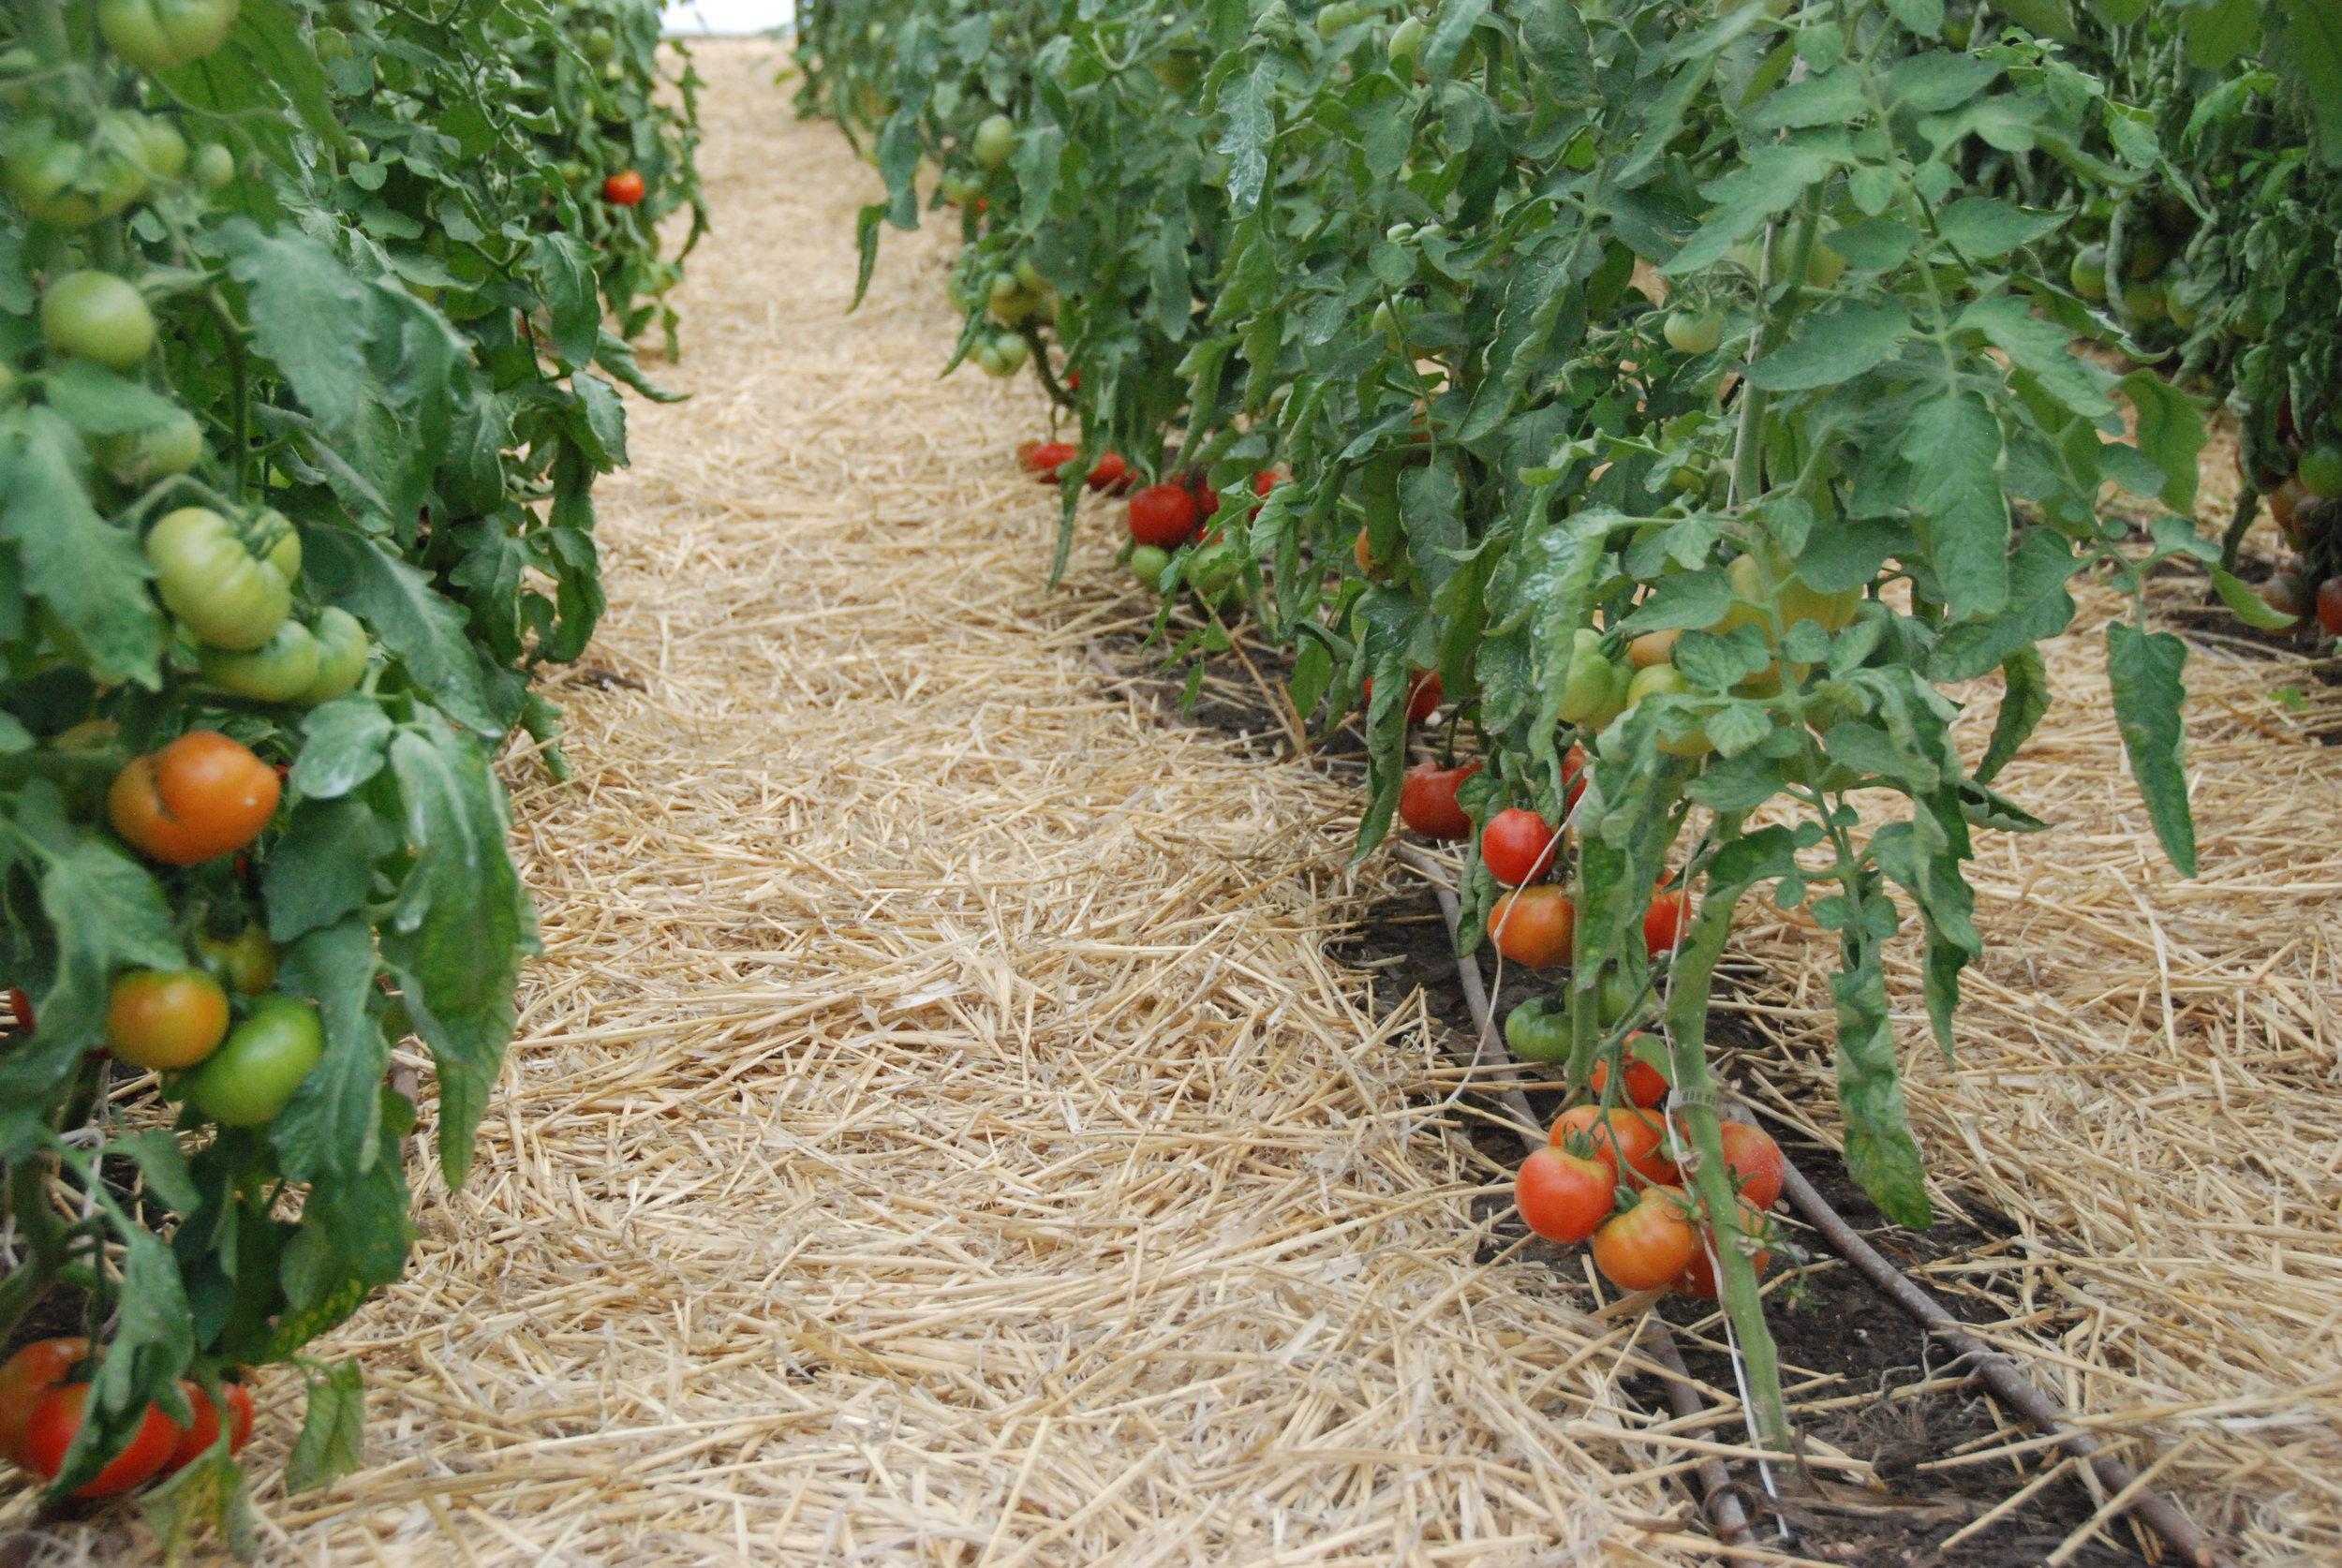 Heirloom Greenhouse Tomatoes - January 2016